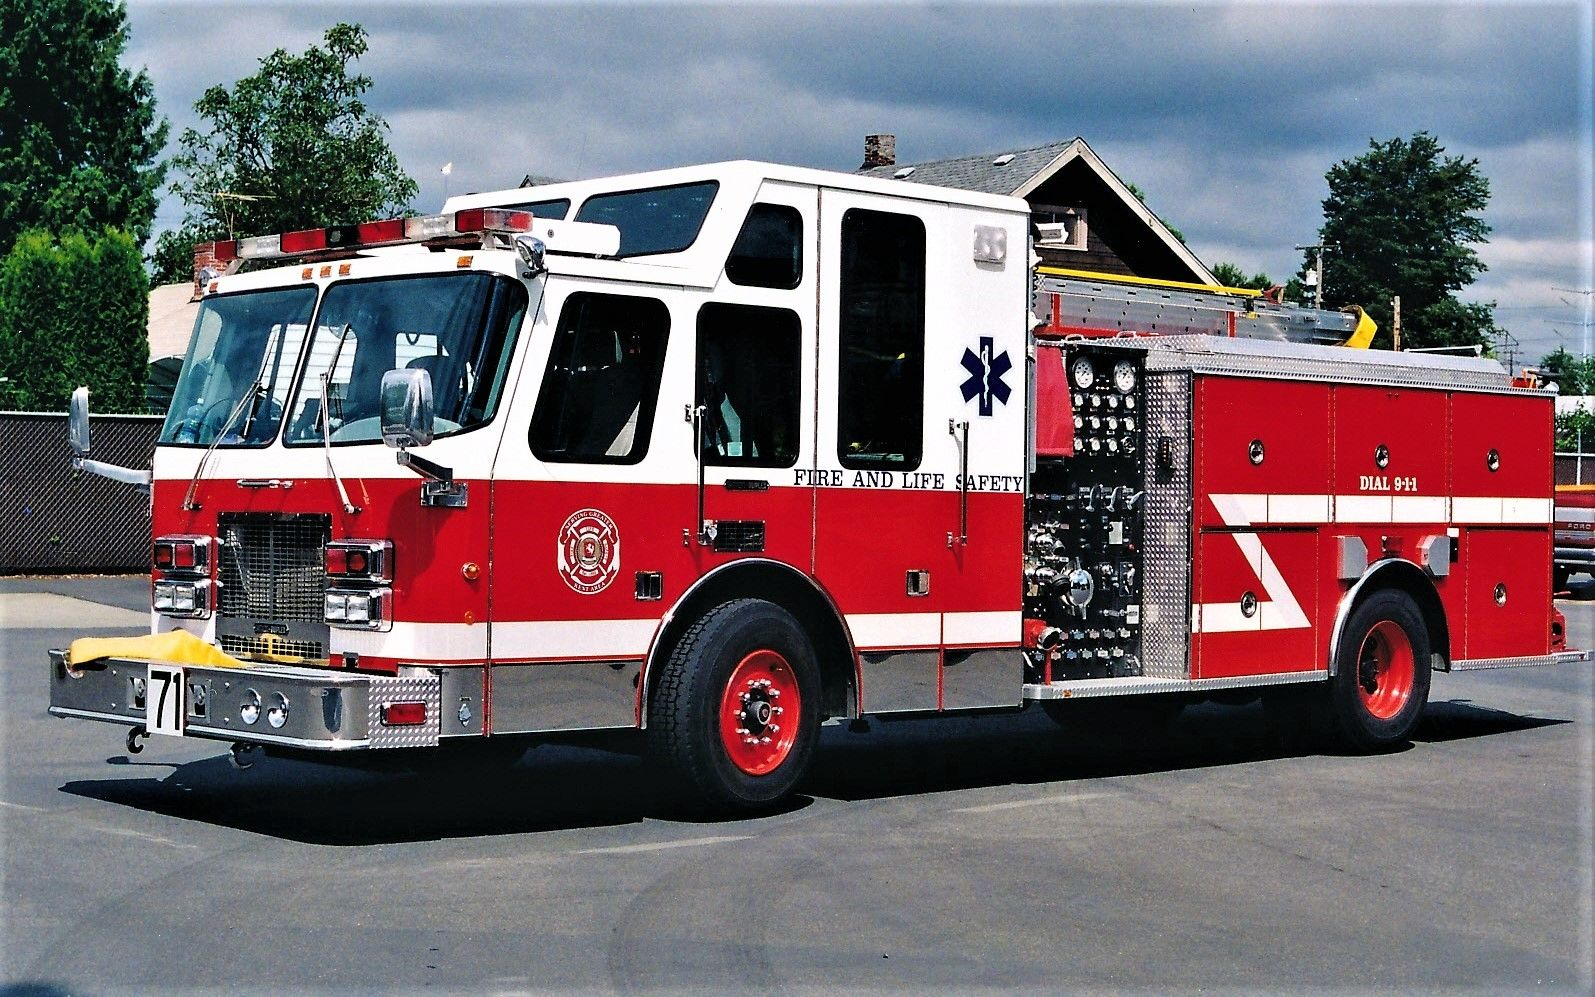 medium resolution of kent fire department engine 71 1997 simon duplex bme 1500 500